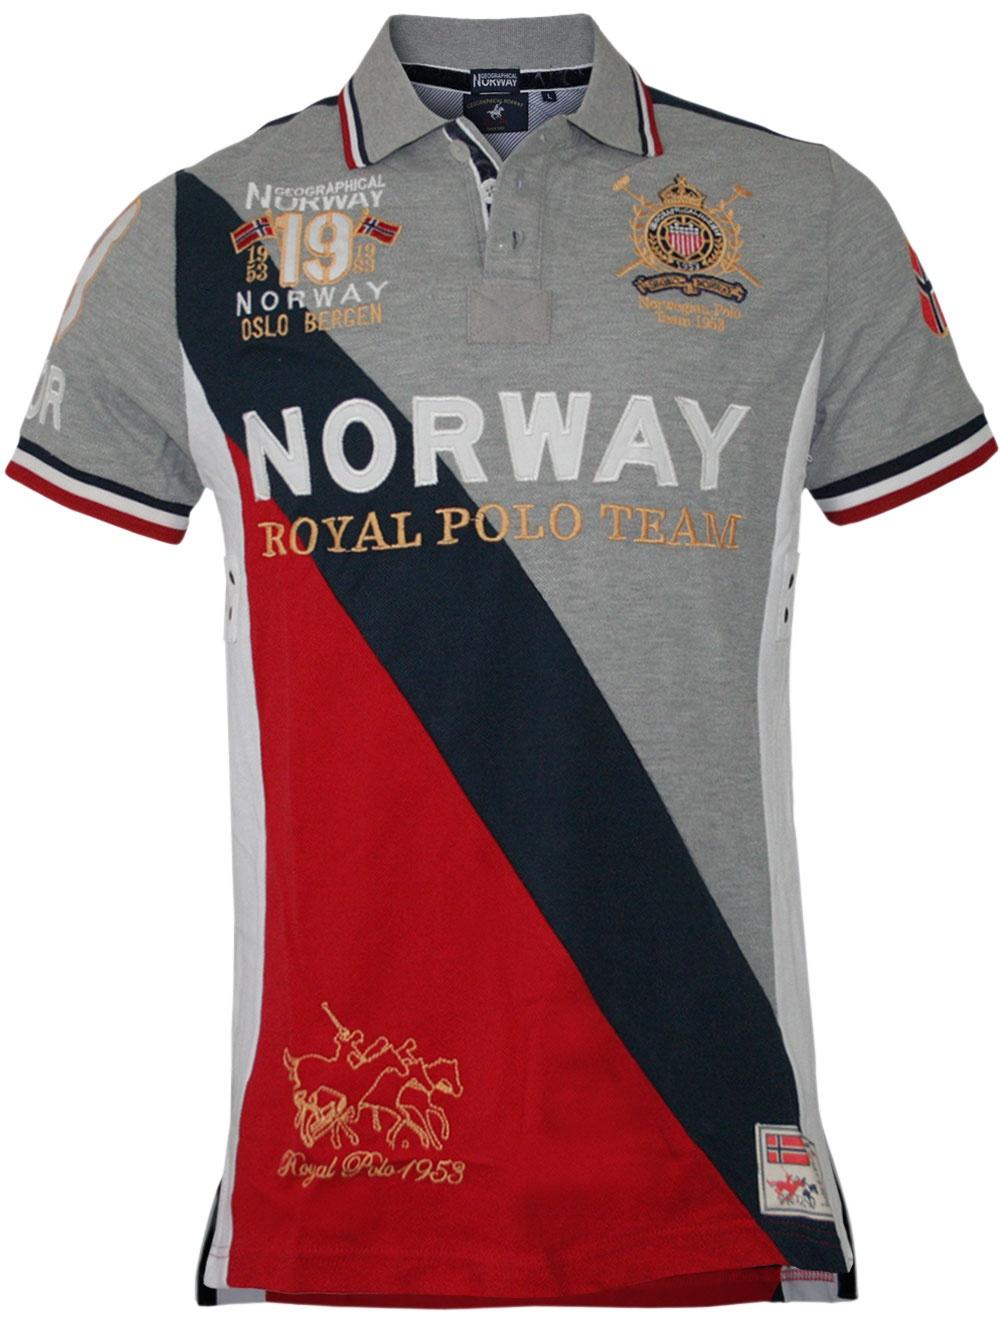 8c2602efd49cc0 Herren Polo Korway (grau) - Geographical Norway 10839 - Polo günstig ...